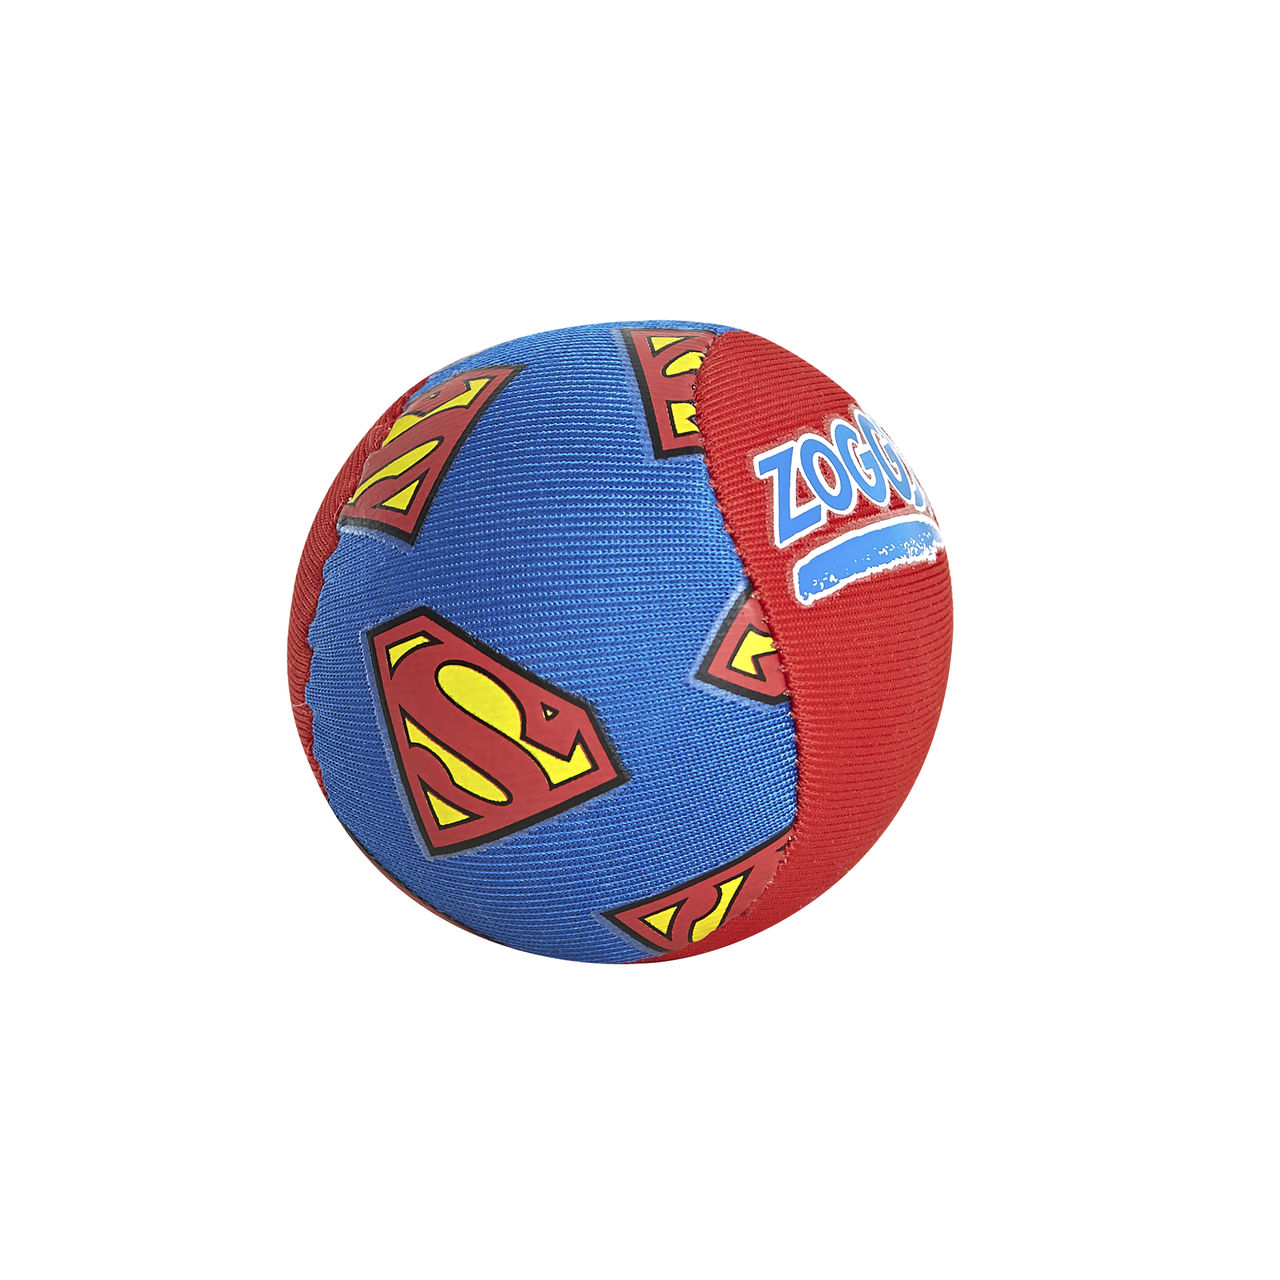 382419_SUPERMAN_BALL_002_3000x3000px_RGB_24